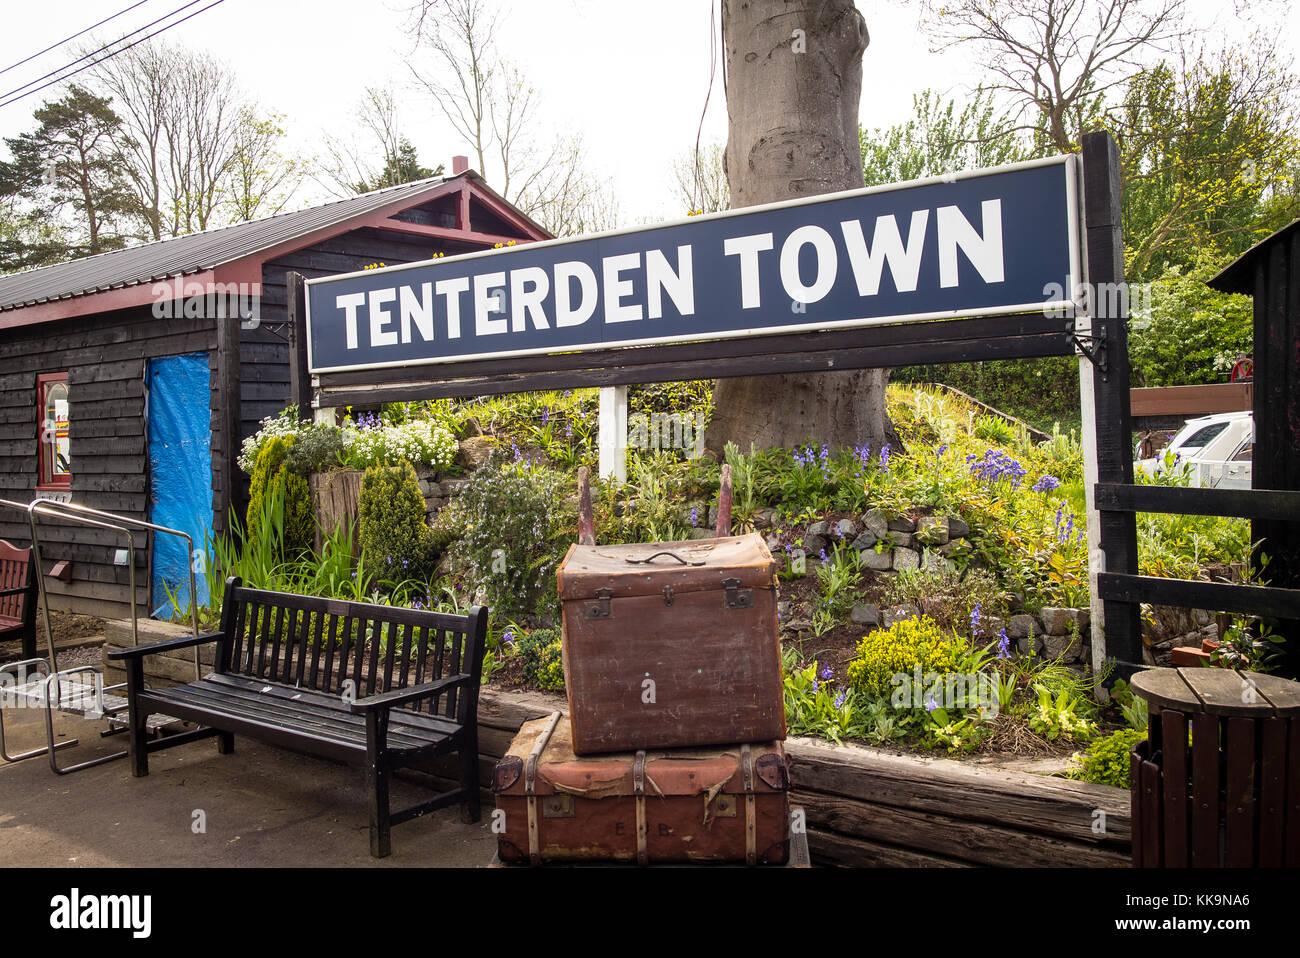 Tenterden Town railway station sign in Kent England UK - Stock Image